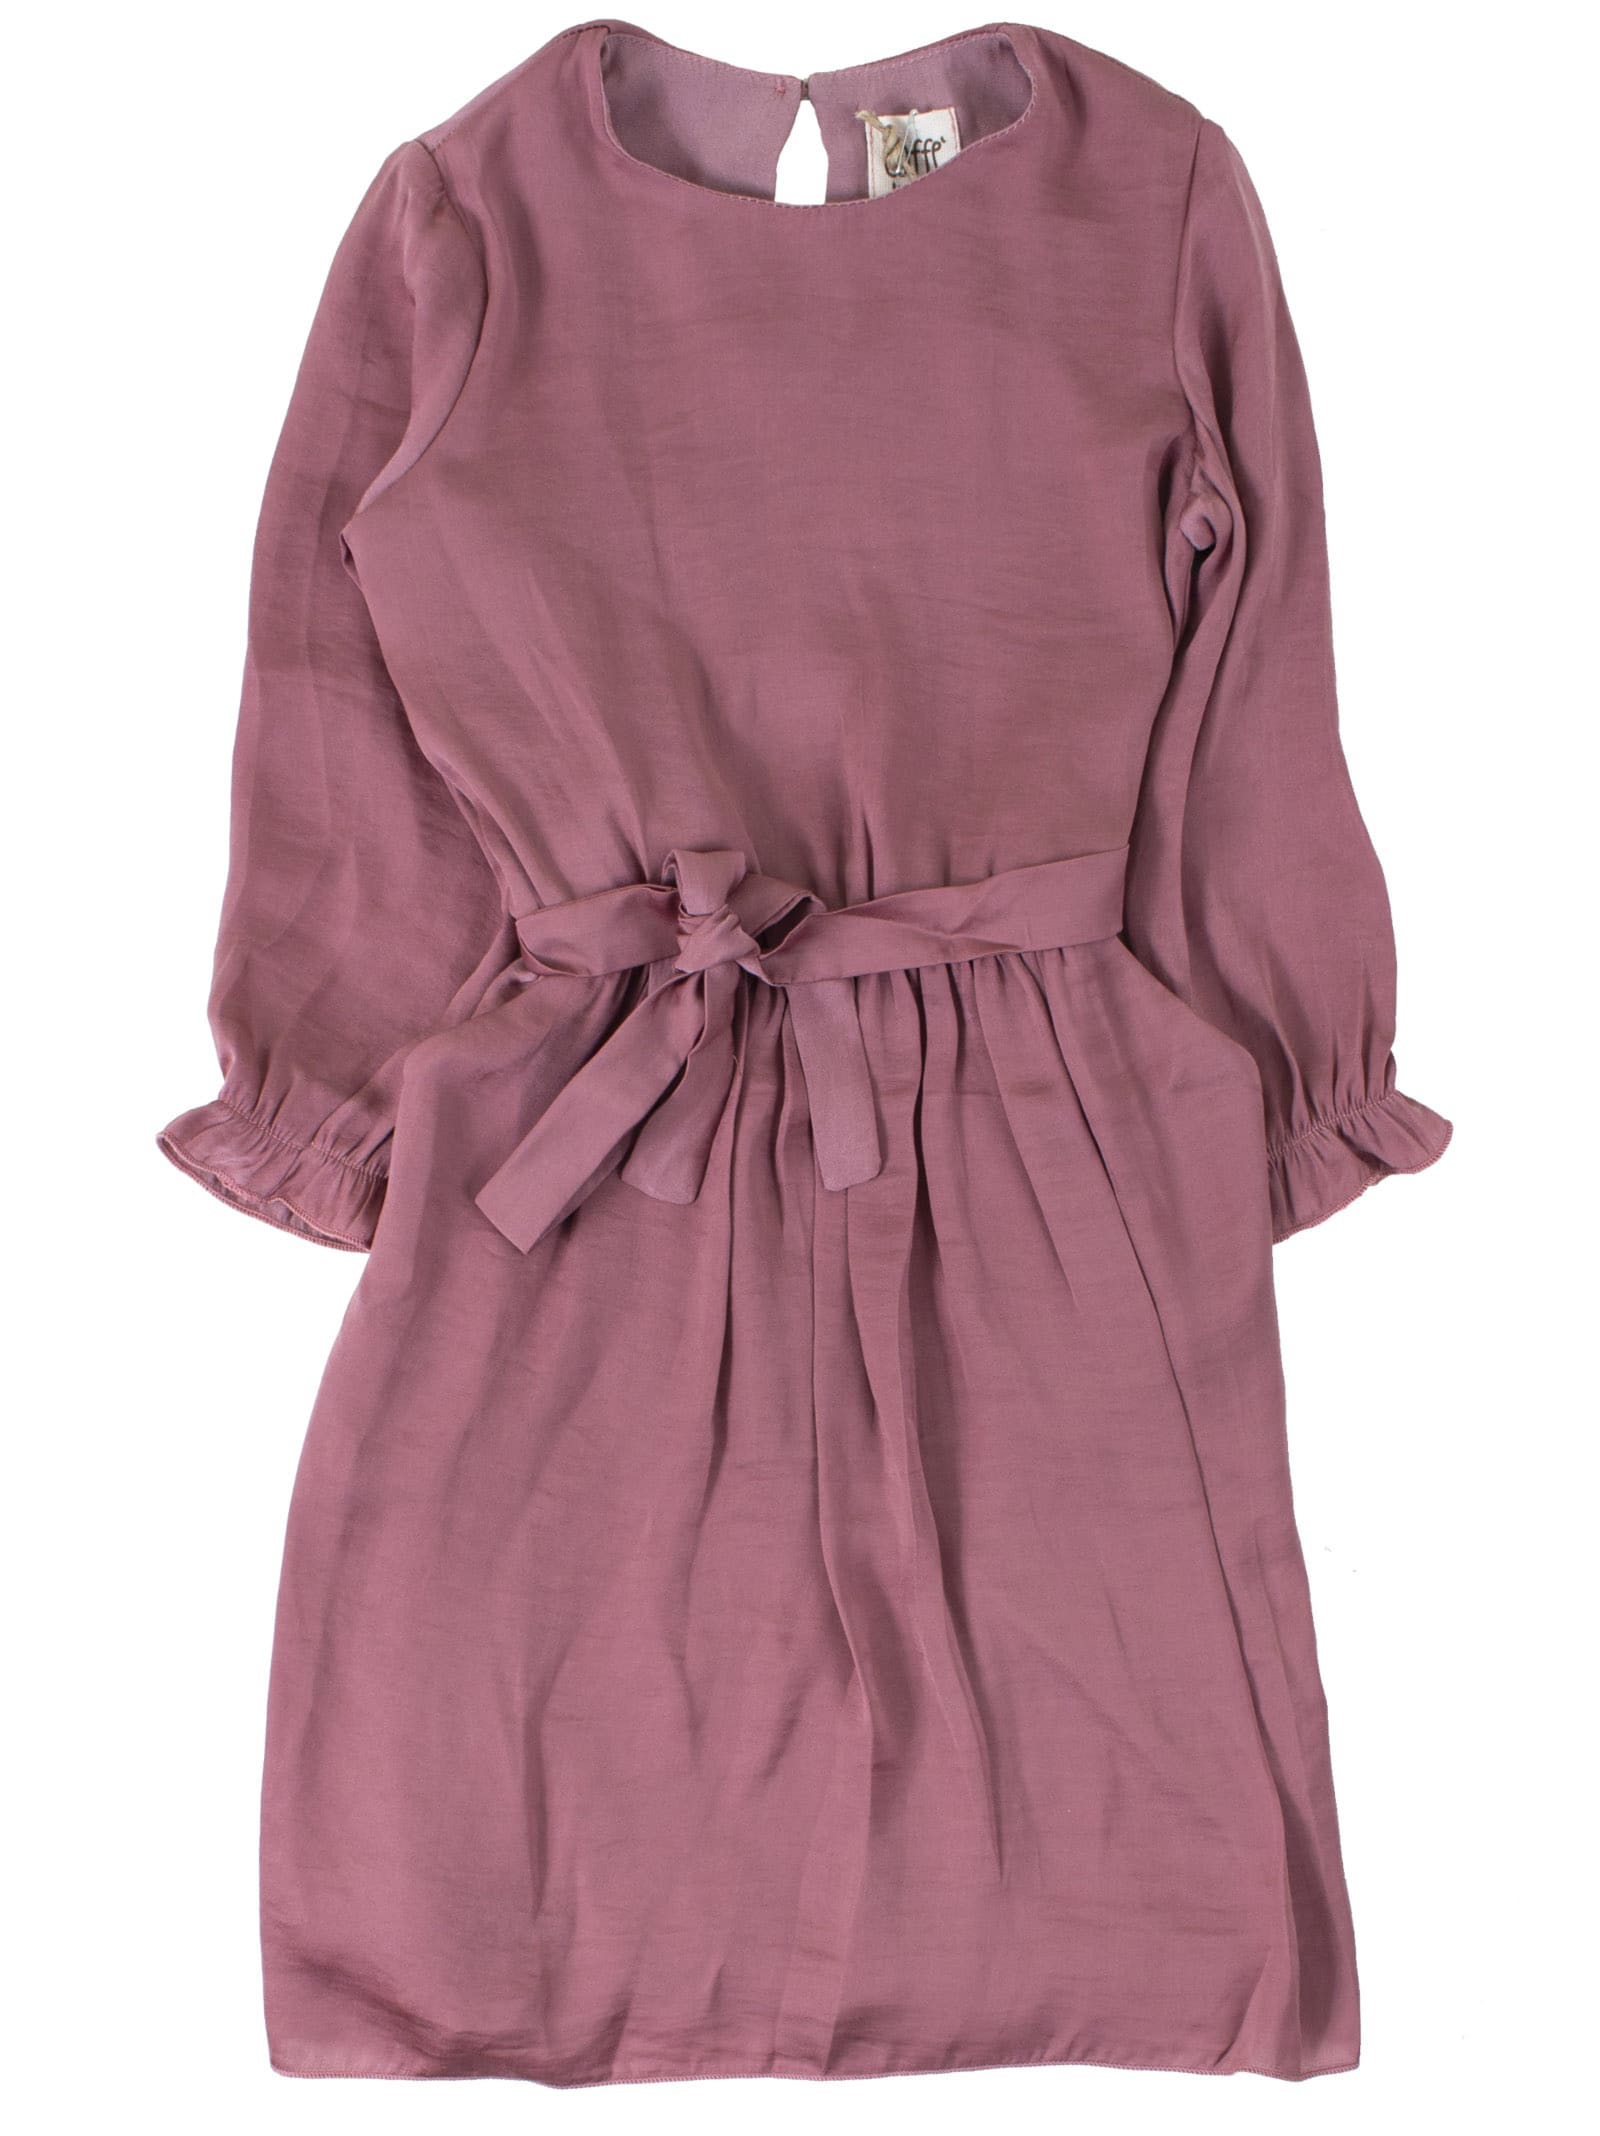 Caffe dOrzo Baby Girl Dress